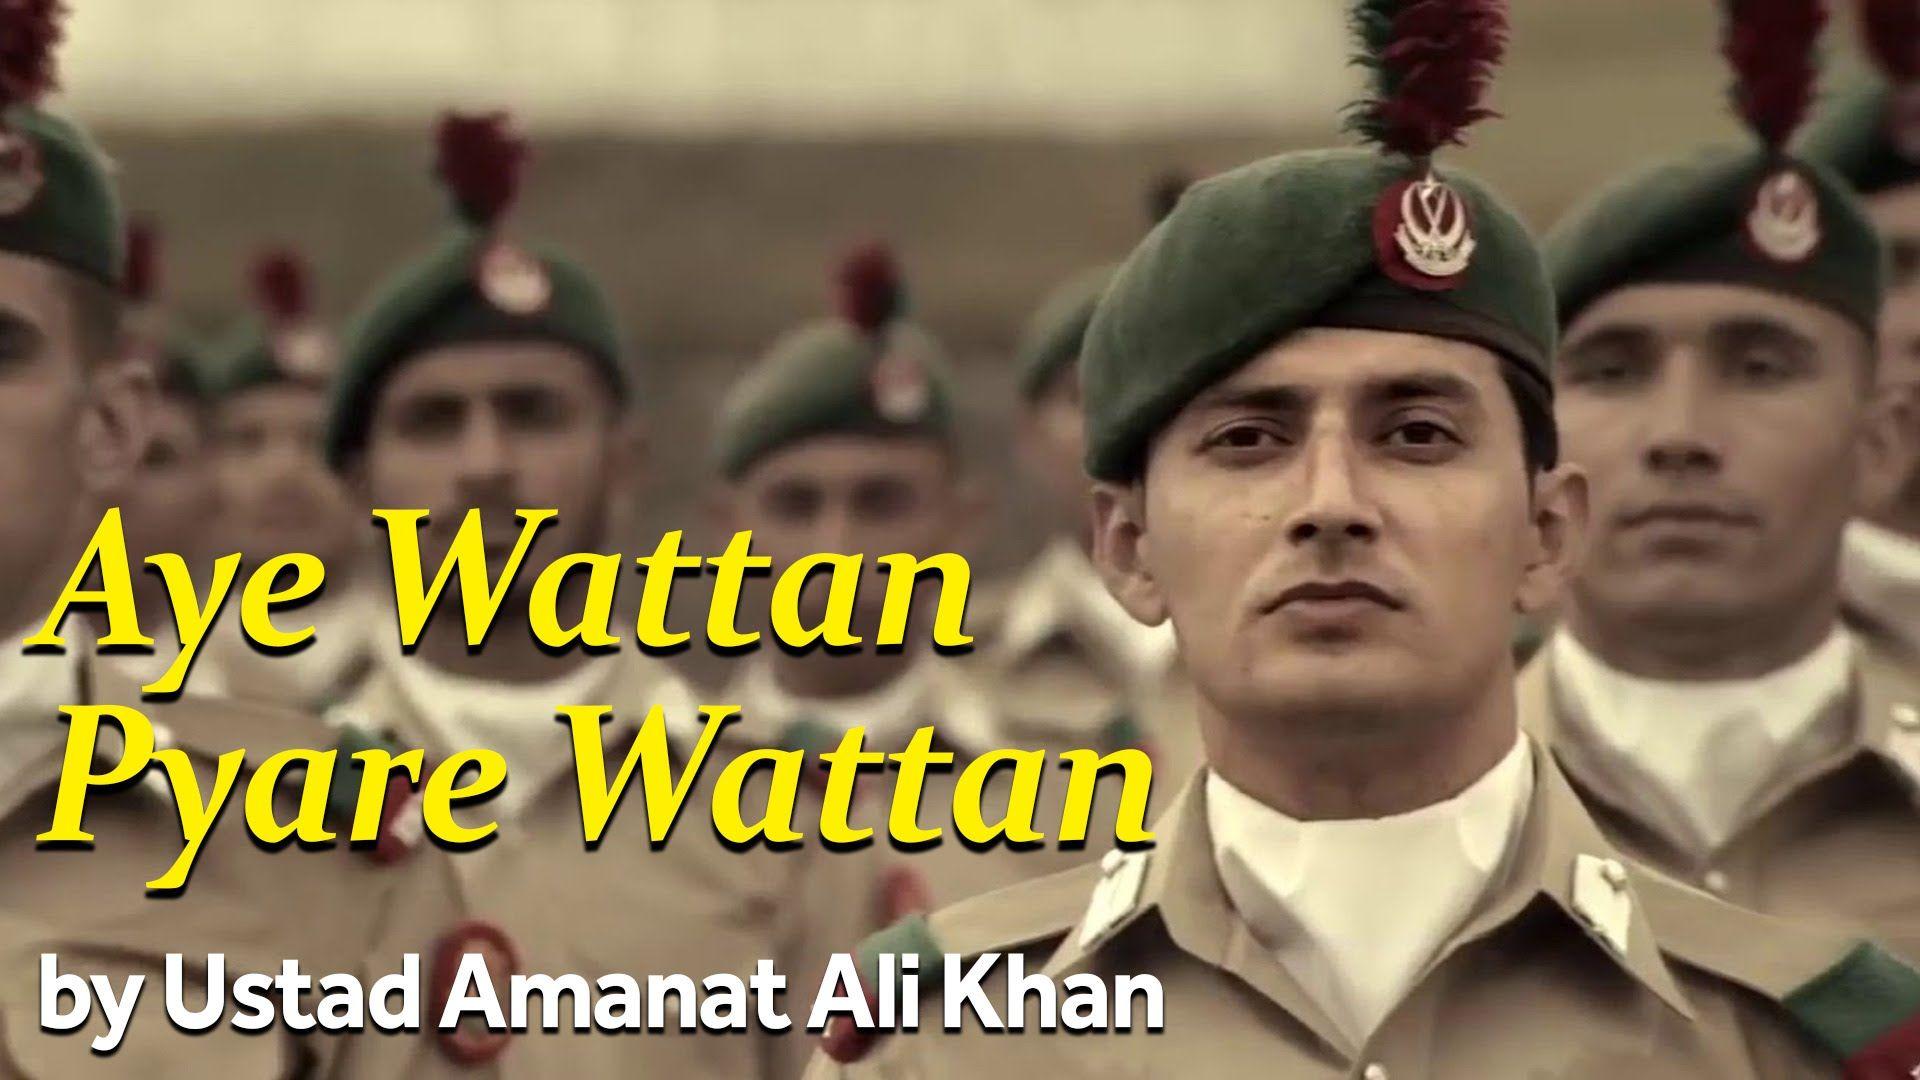 Aye Wattan Pyare Wattan   Pakistani Songs   Ustad Amanat Ali